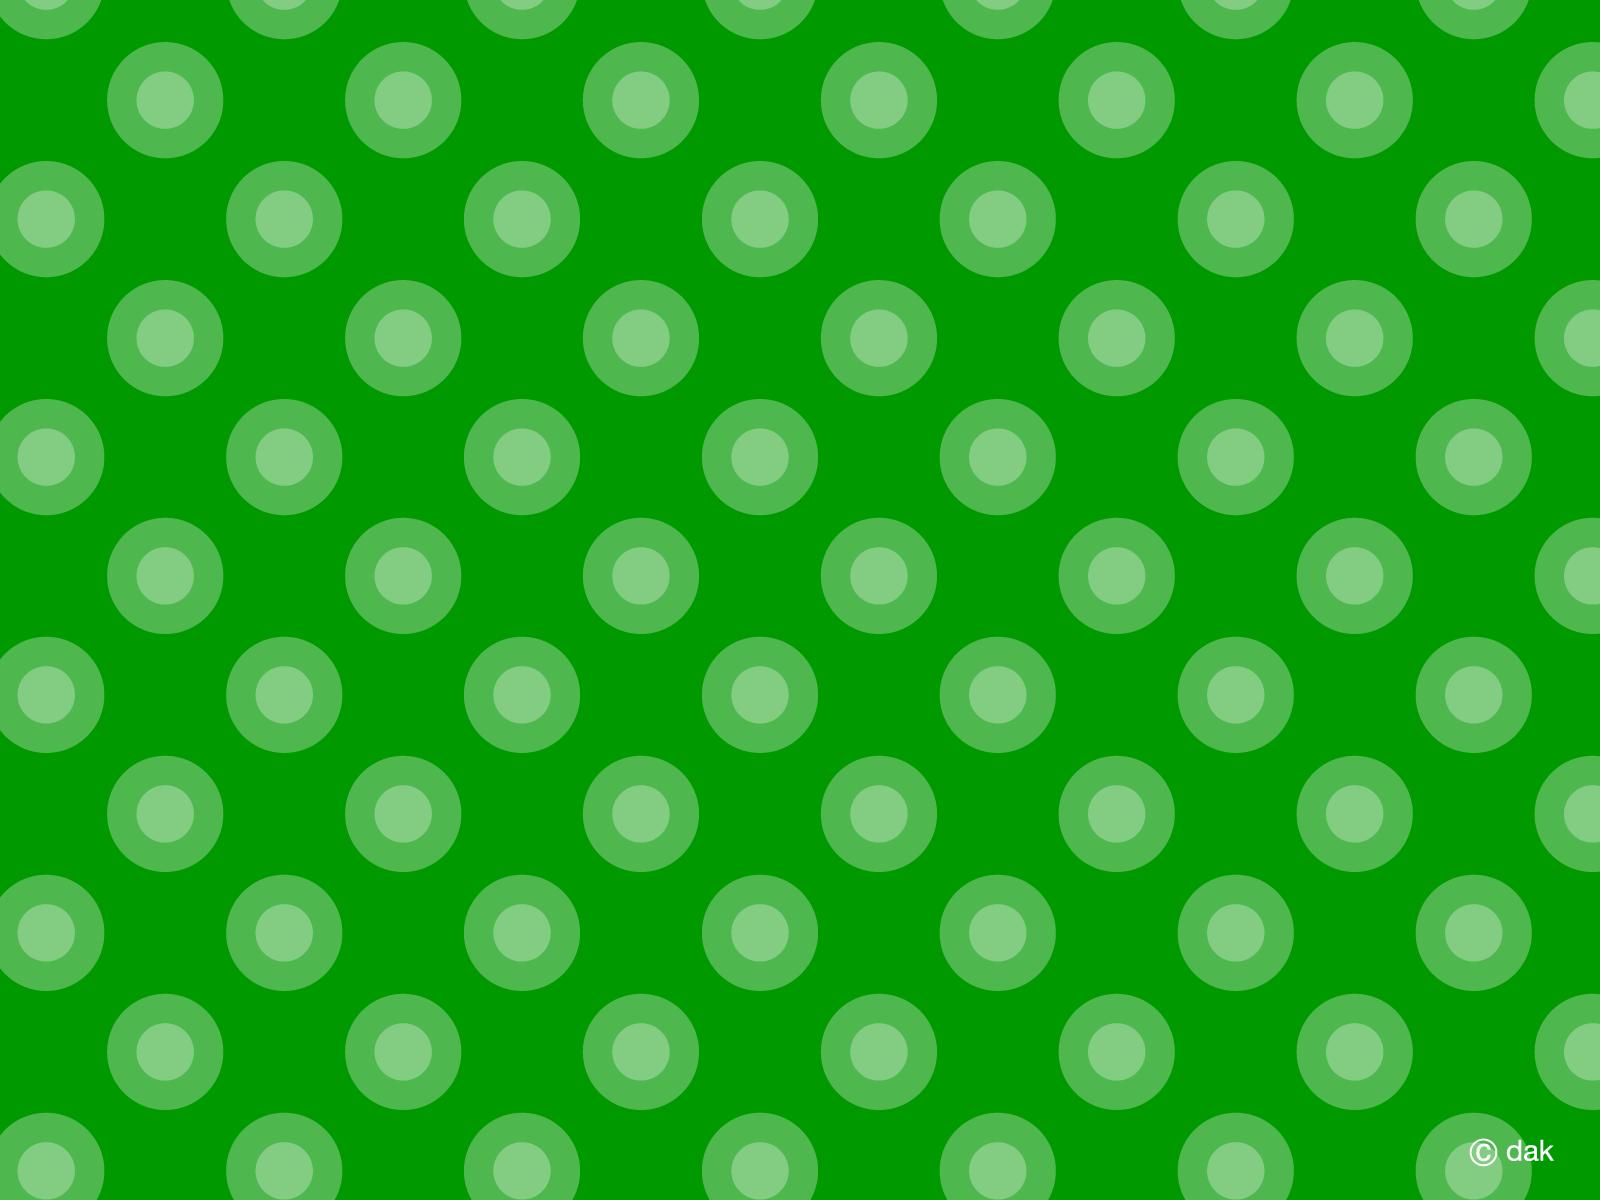 Polka dot wallpaper wallpapersafari for Polka dot wallpaper